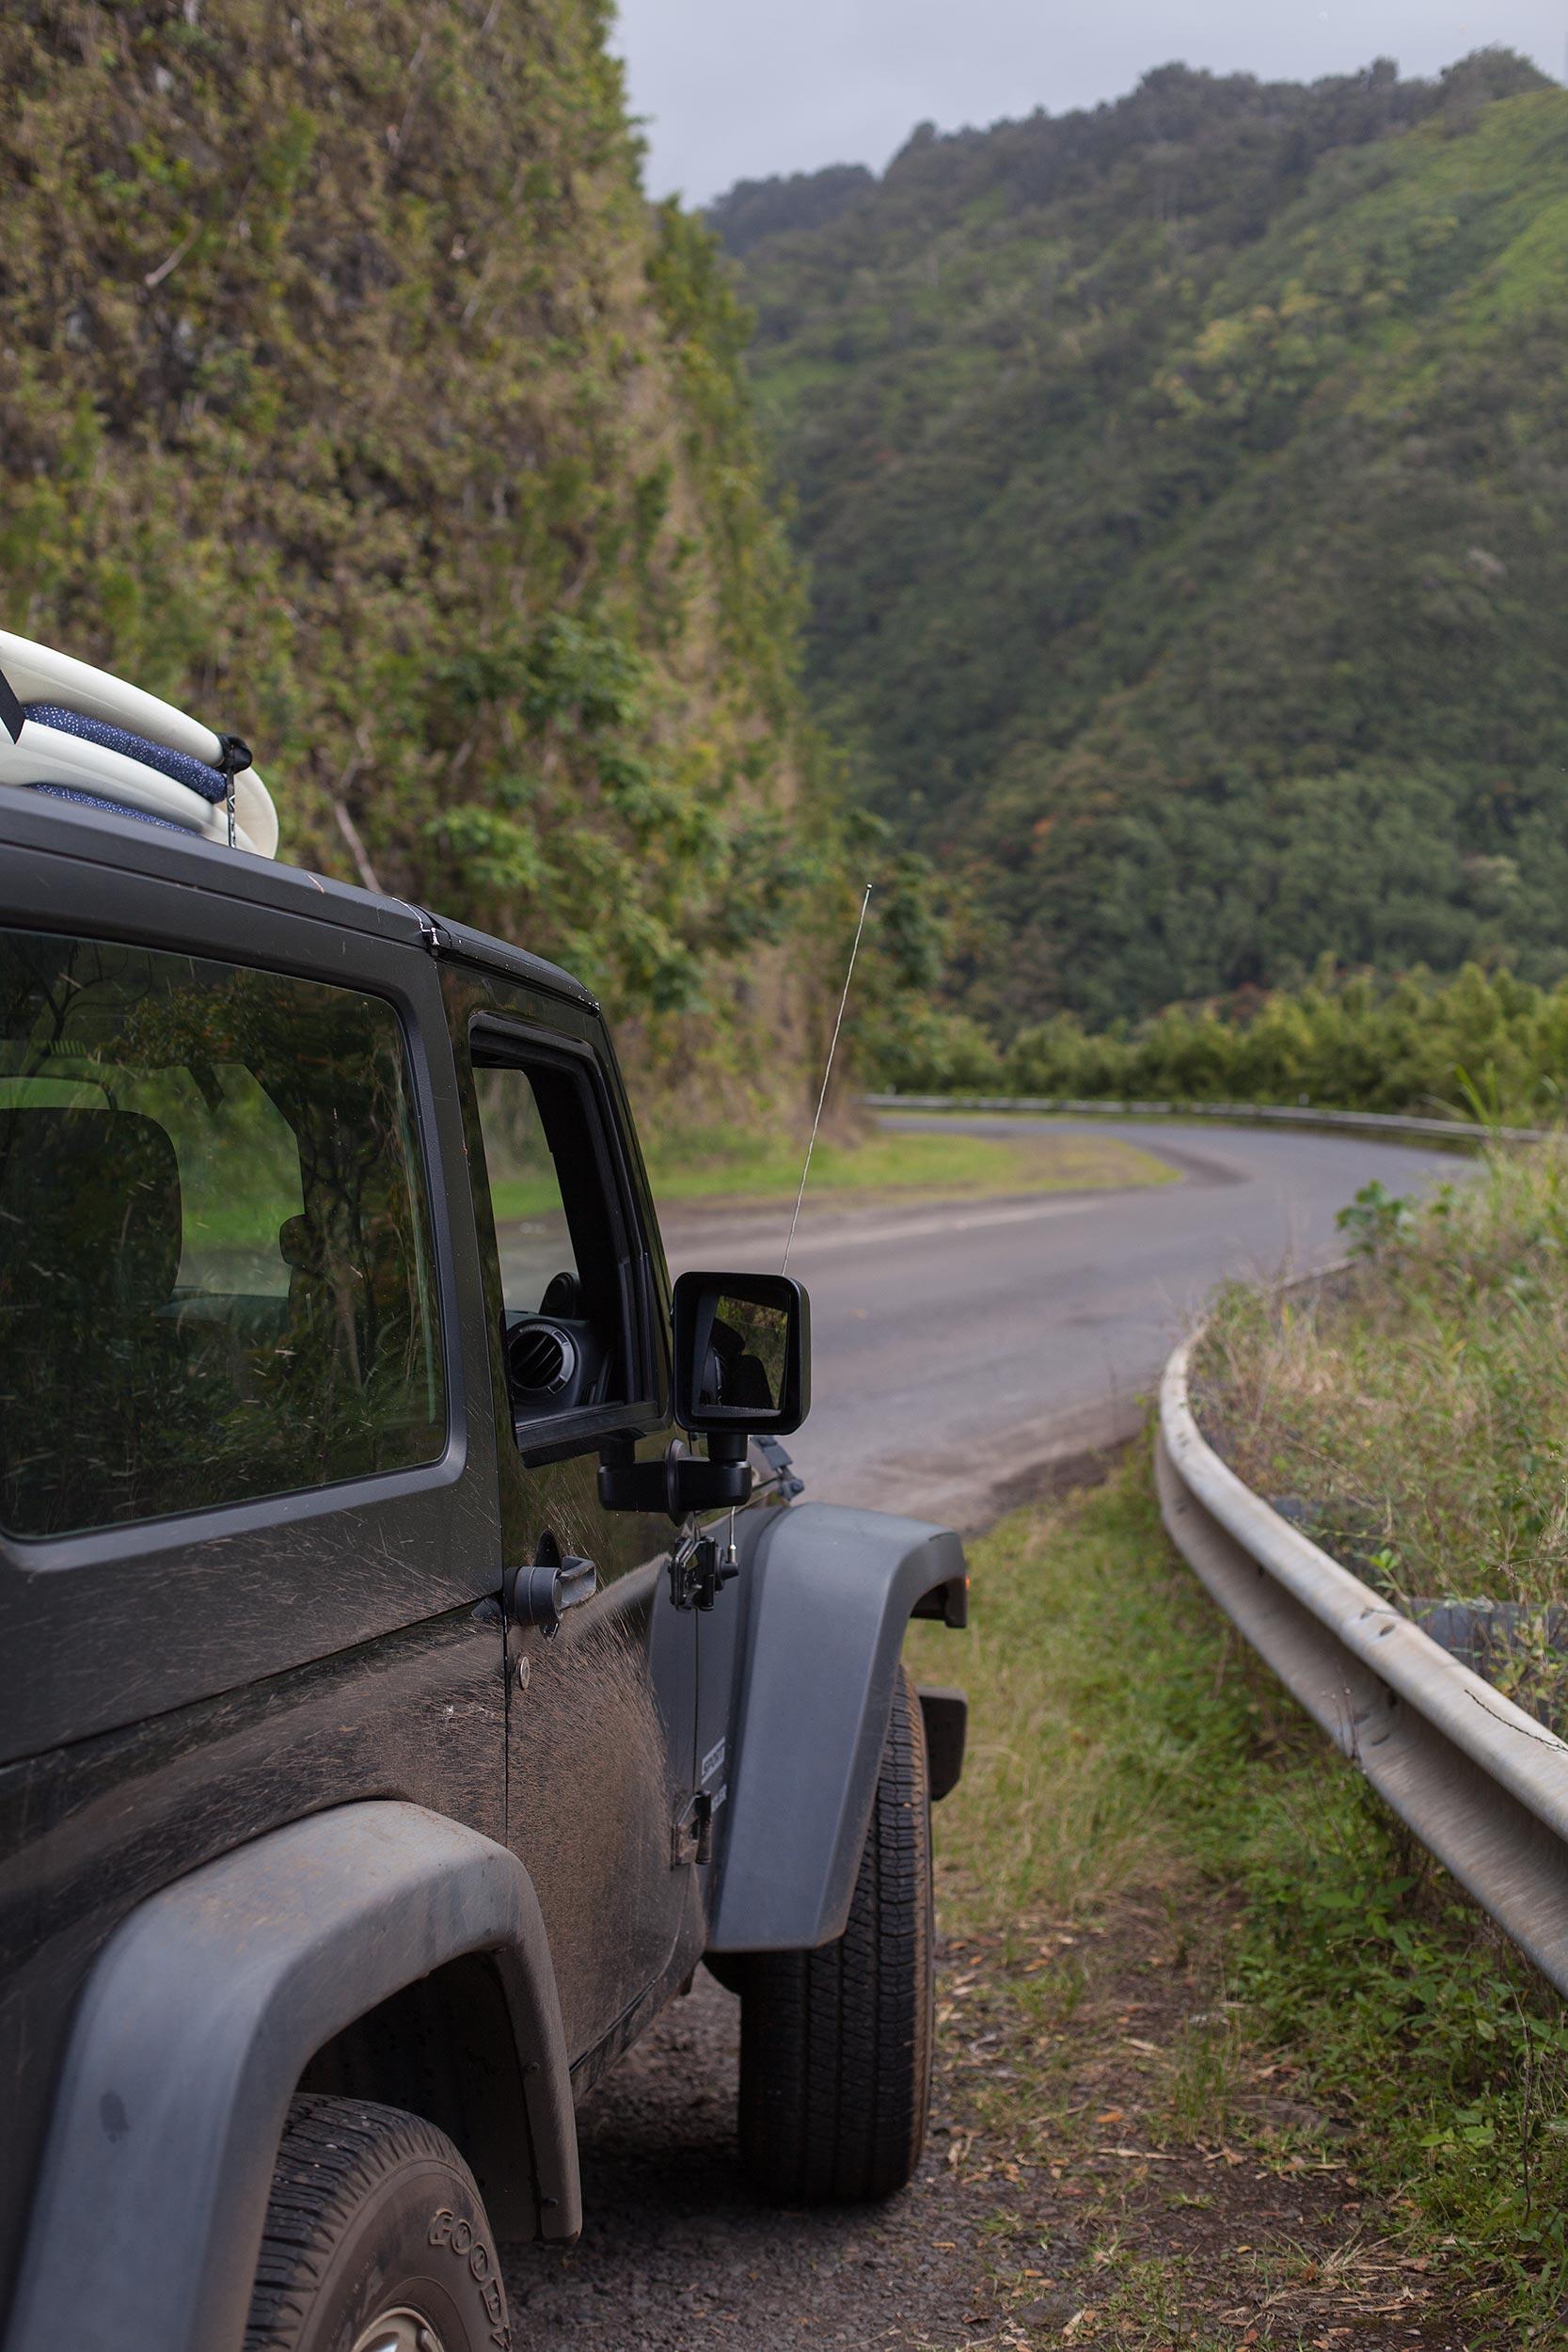 Wrangler-Jeep-sport-road-Maui-Hawaii.jpg